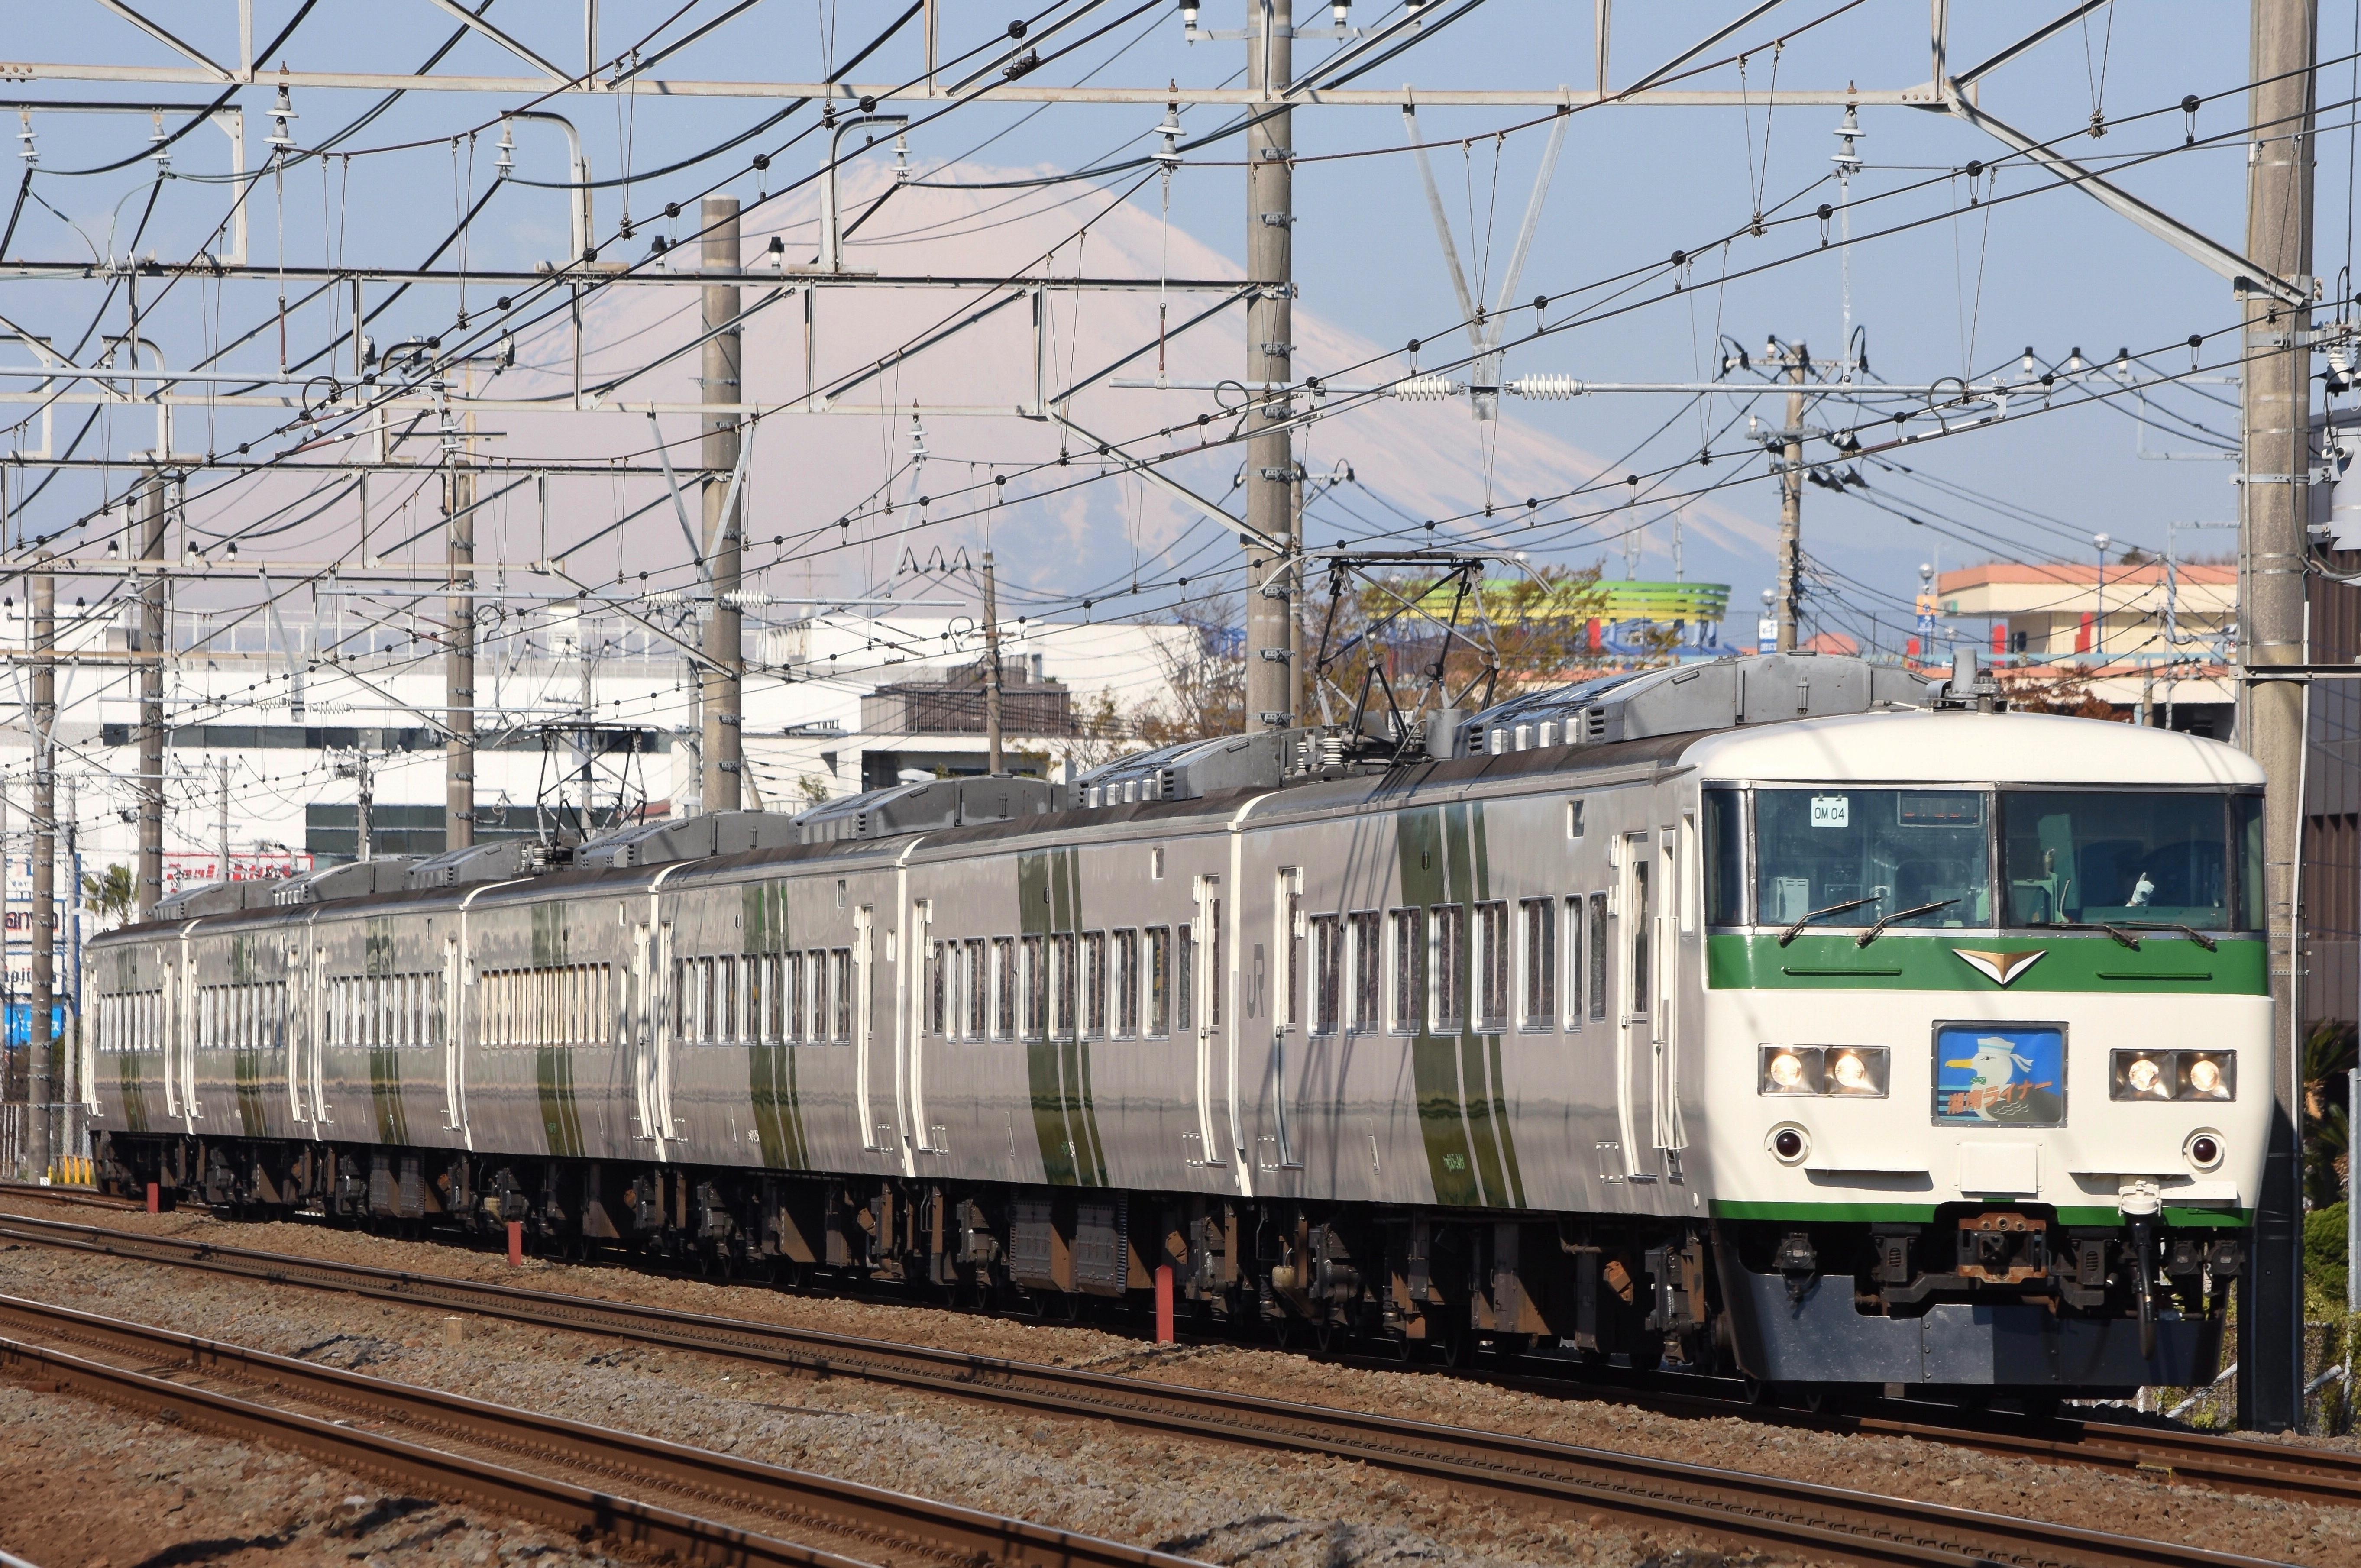 f:id:Nagaoka103:20190407162750j:image